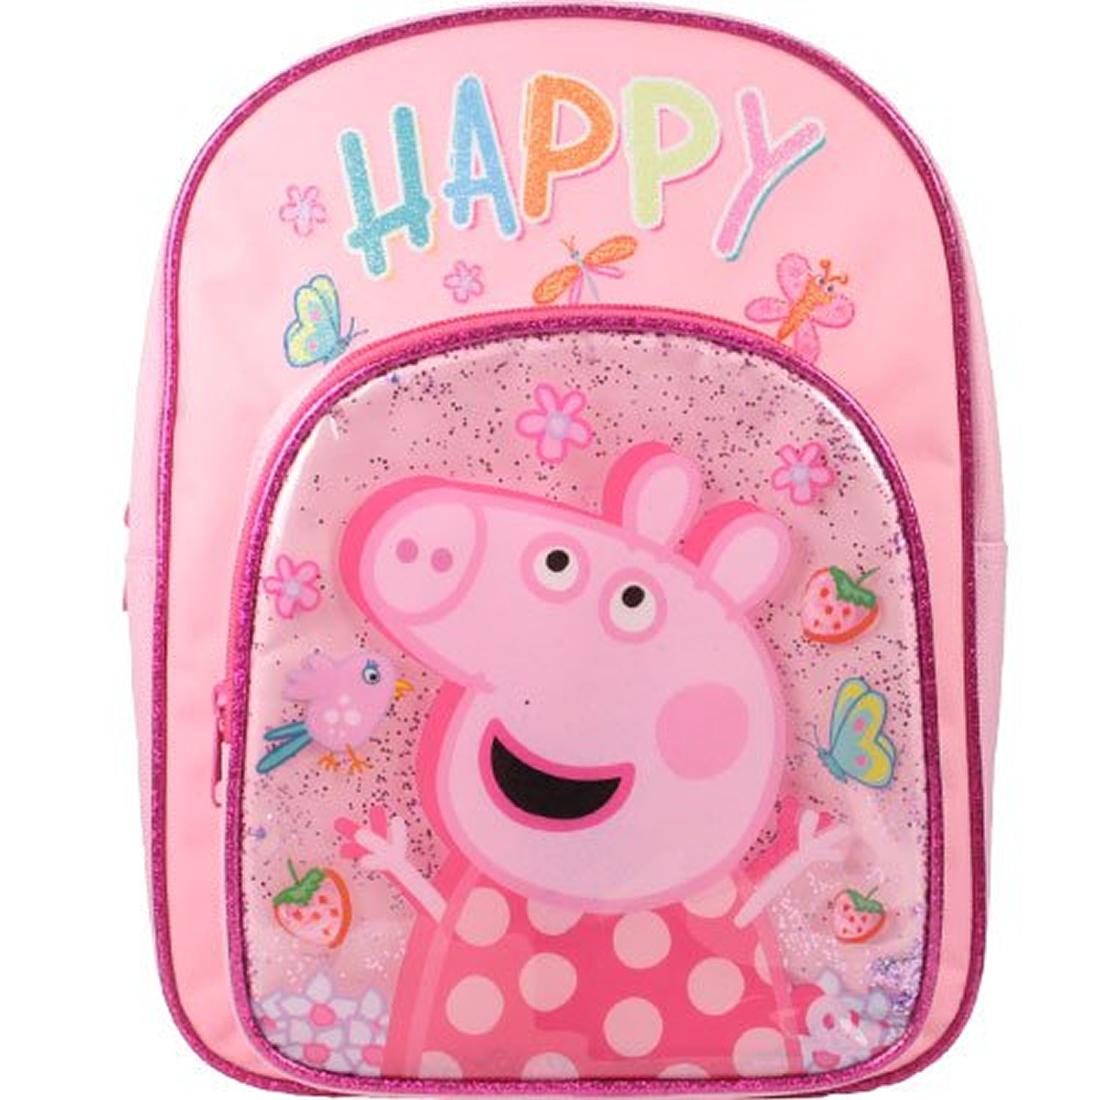 Peppa Pig Beautiful Arch School Bag Rucksack Backpack